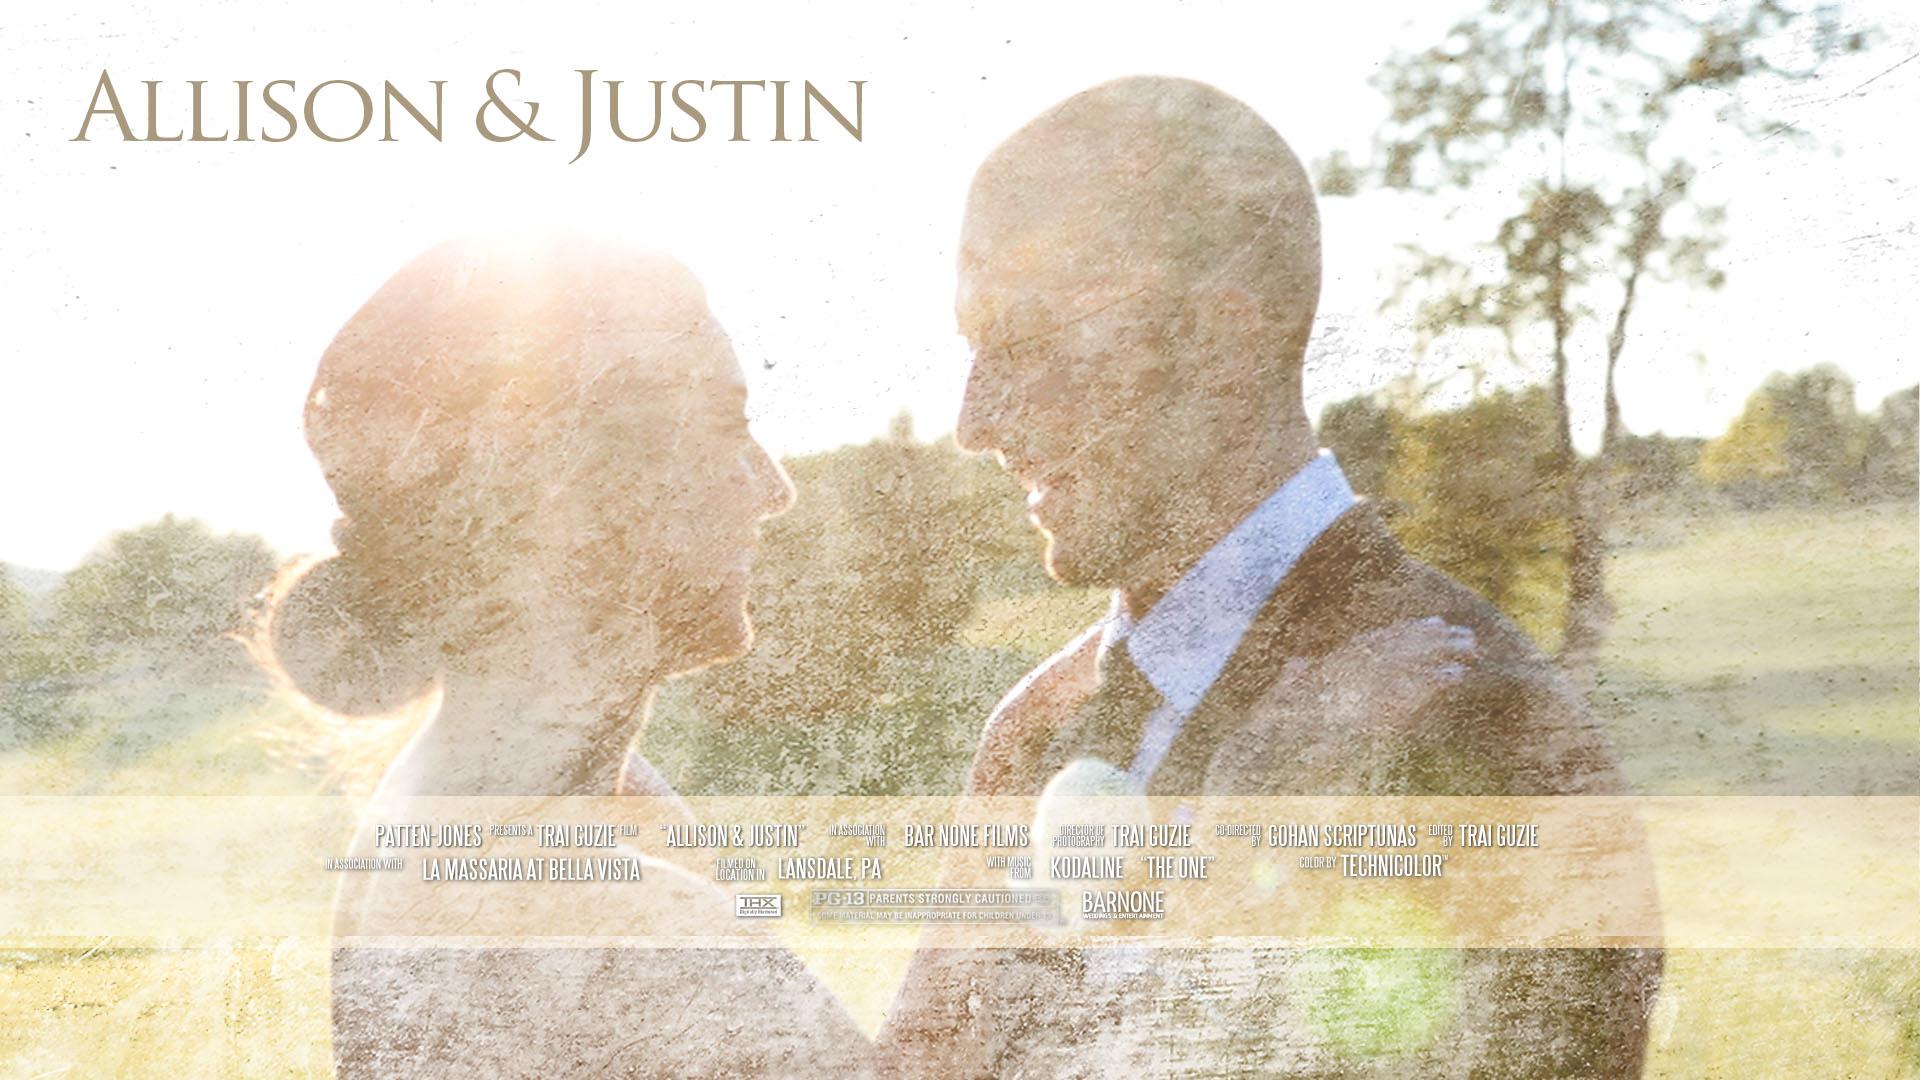 movie-poster-allison-justin